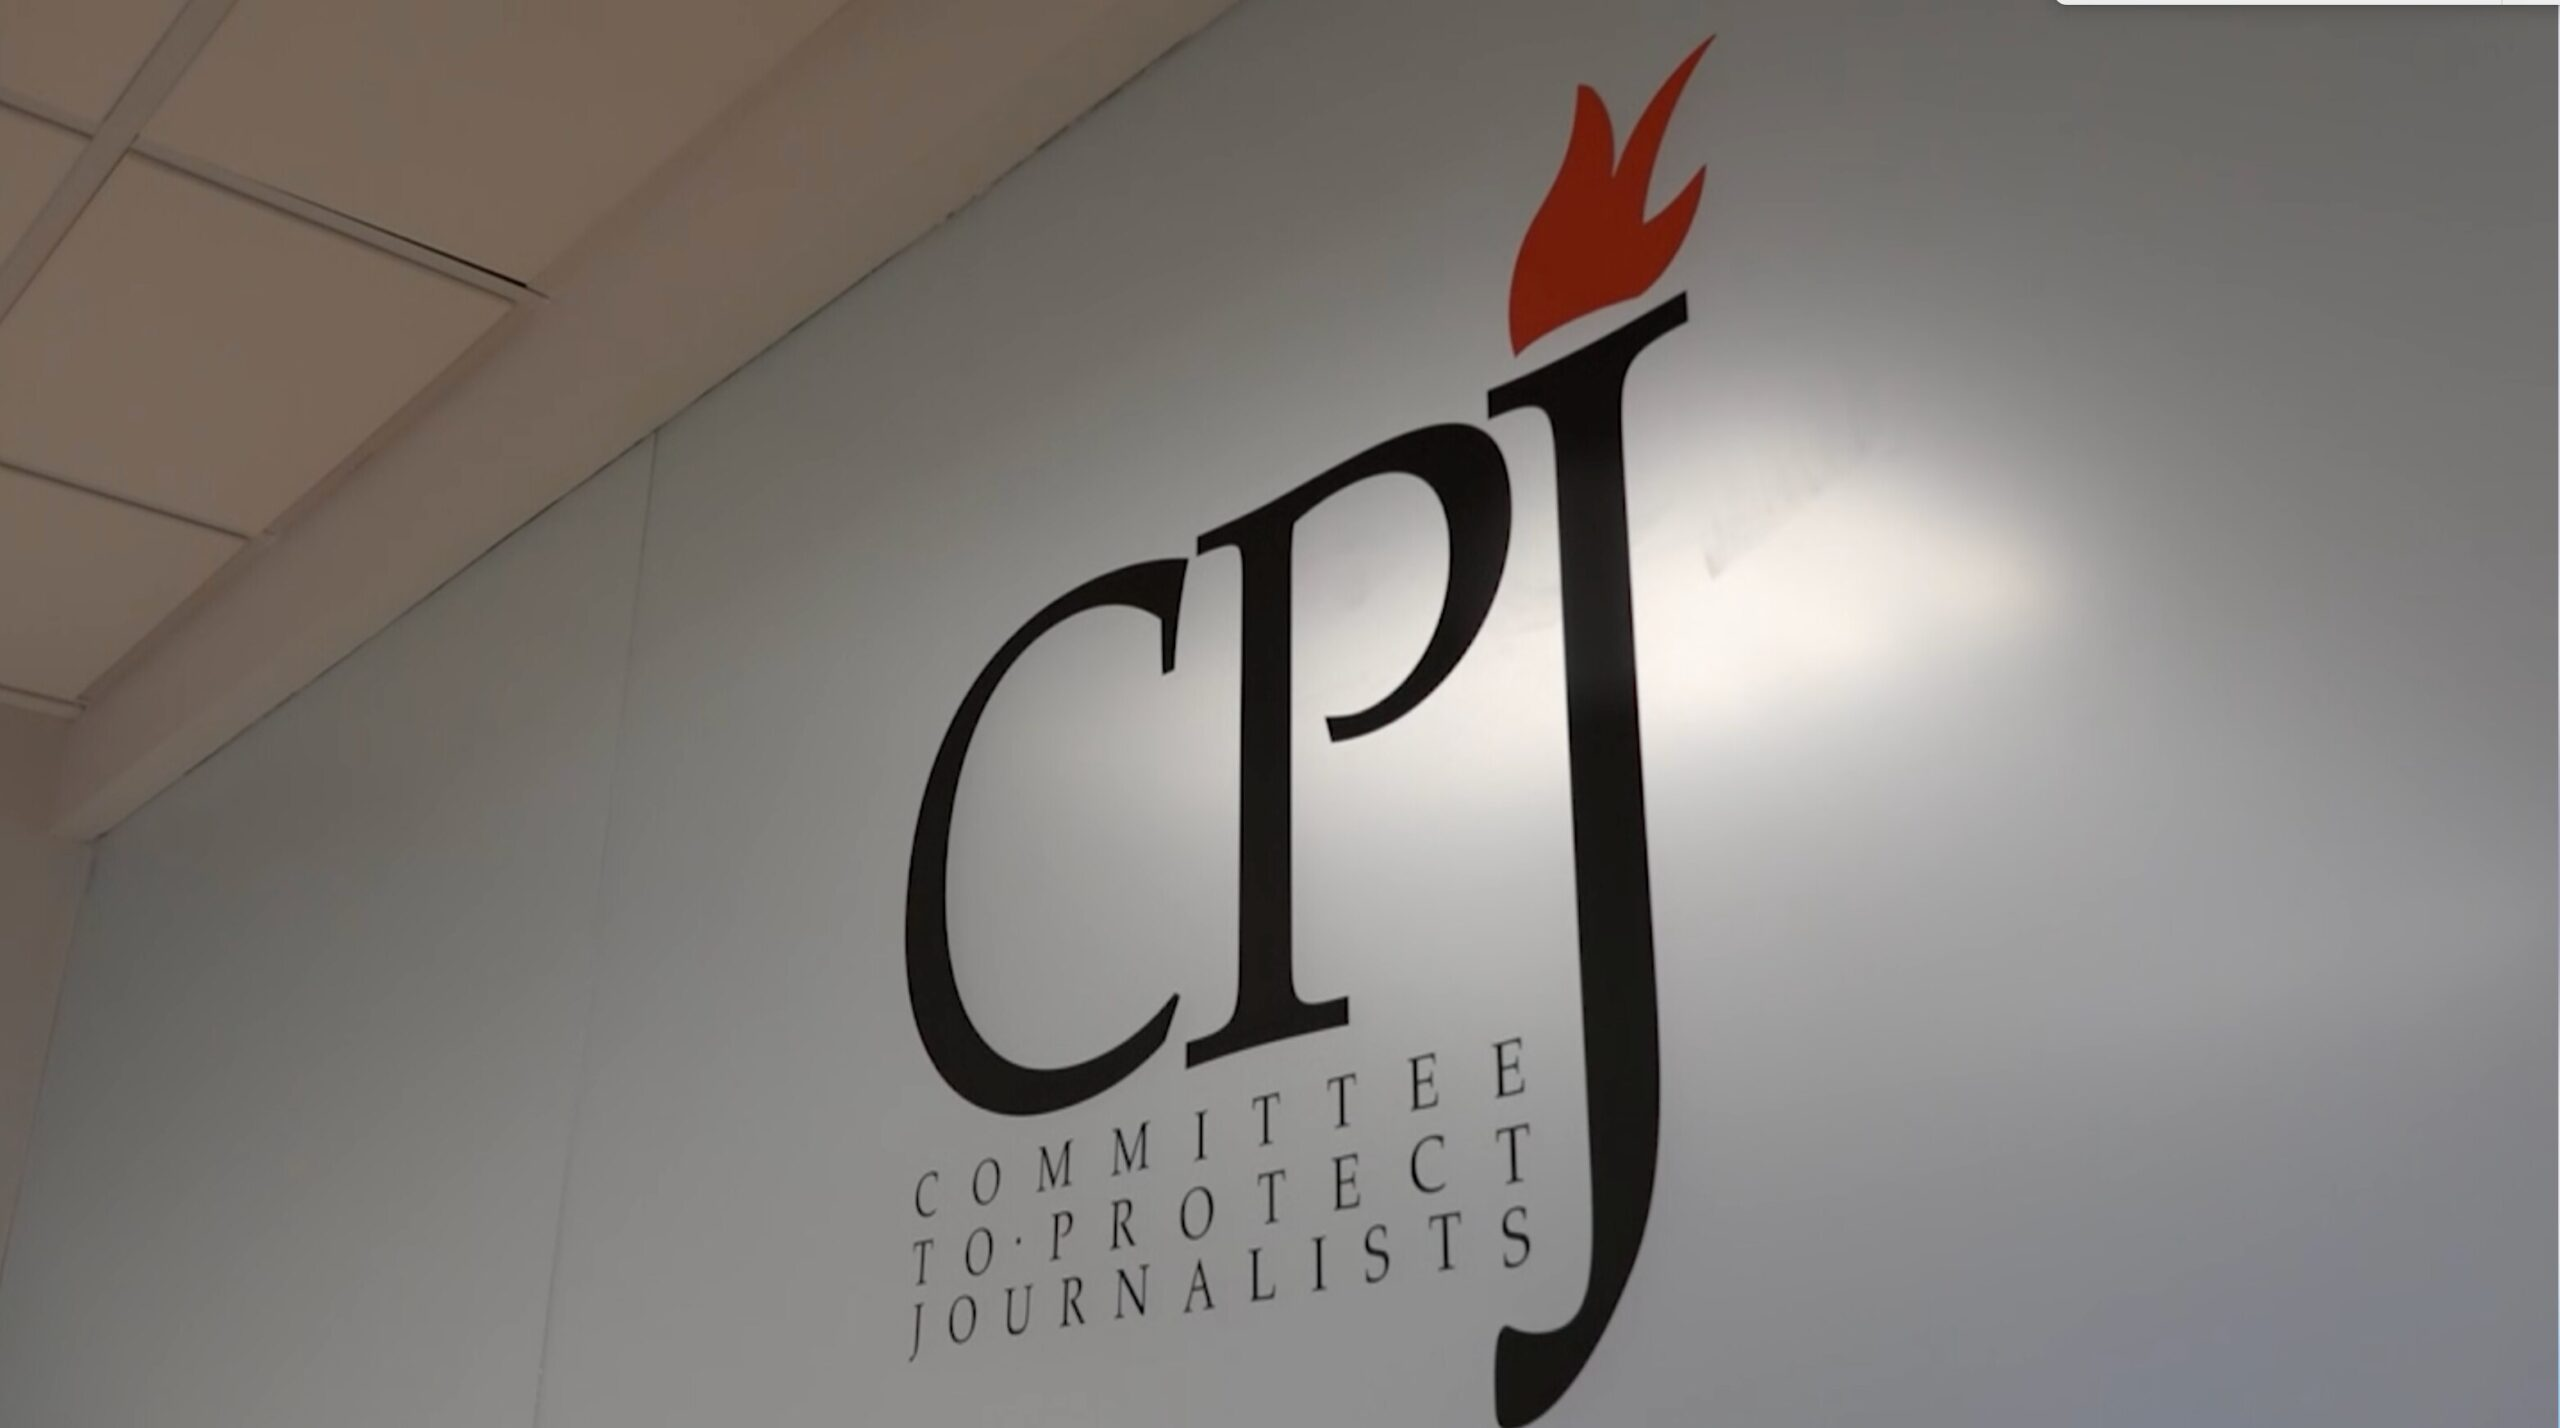 Comite para proteger periodistas scaled